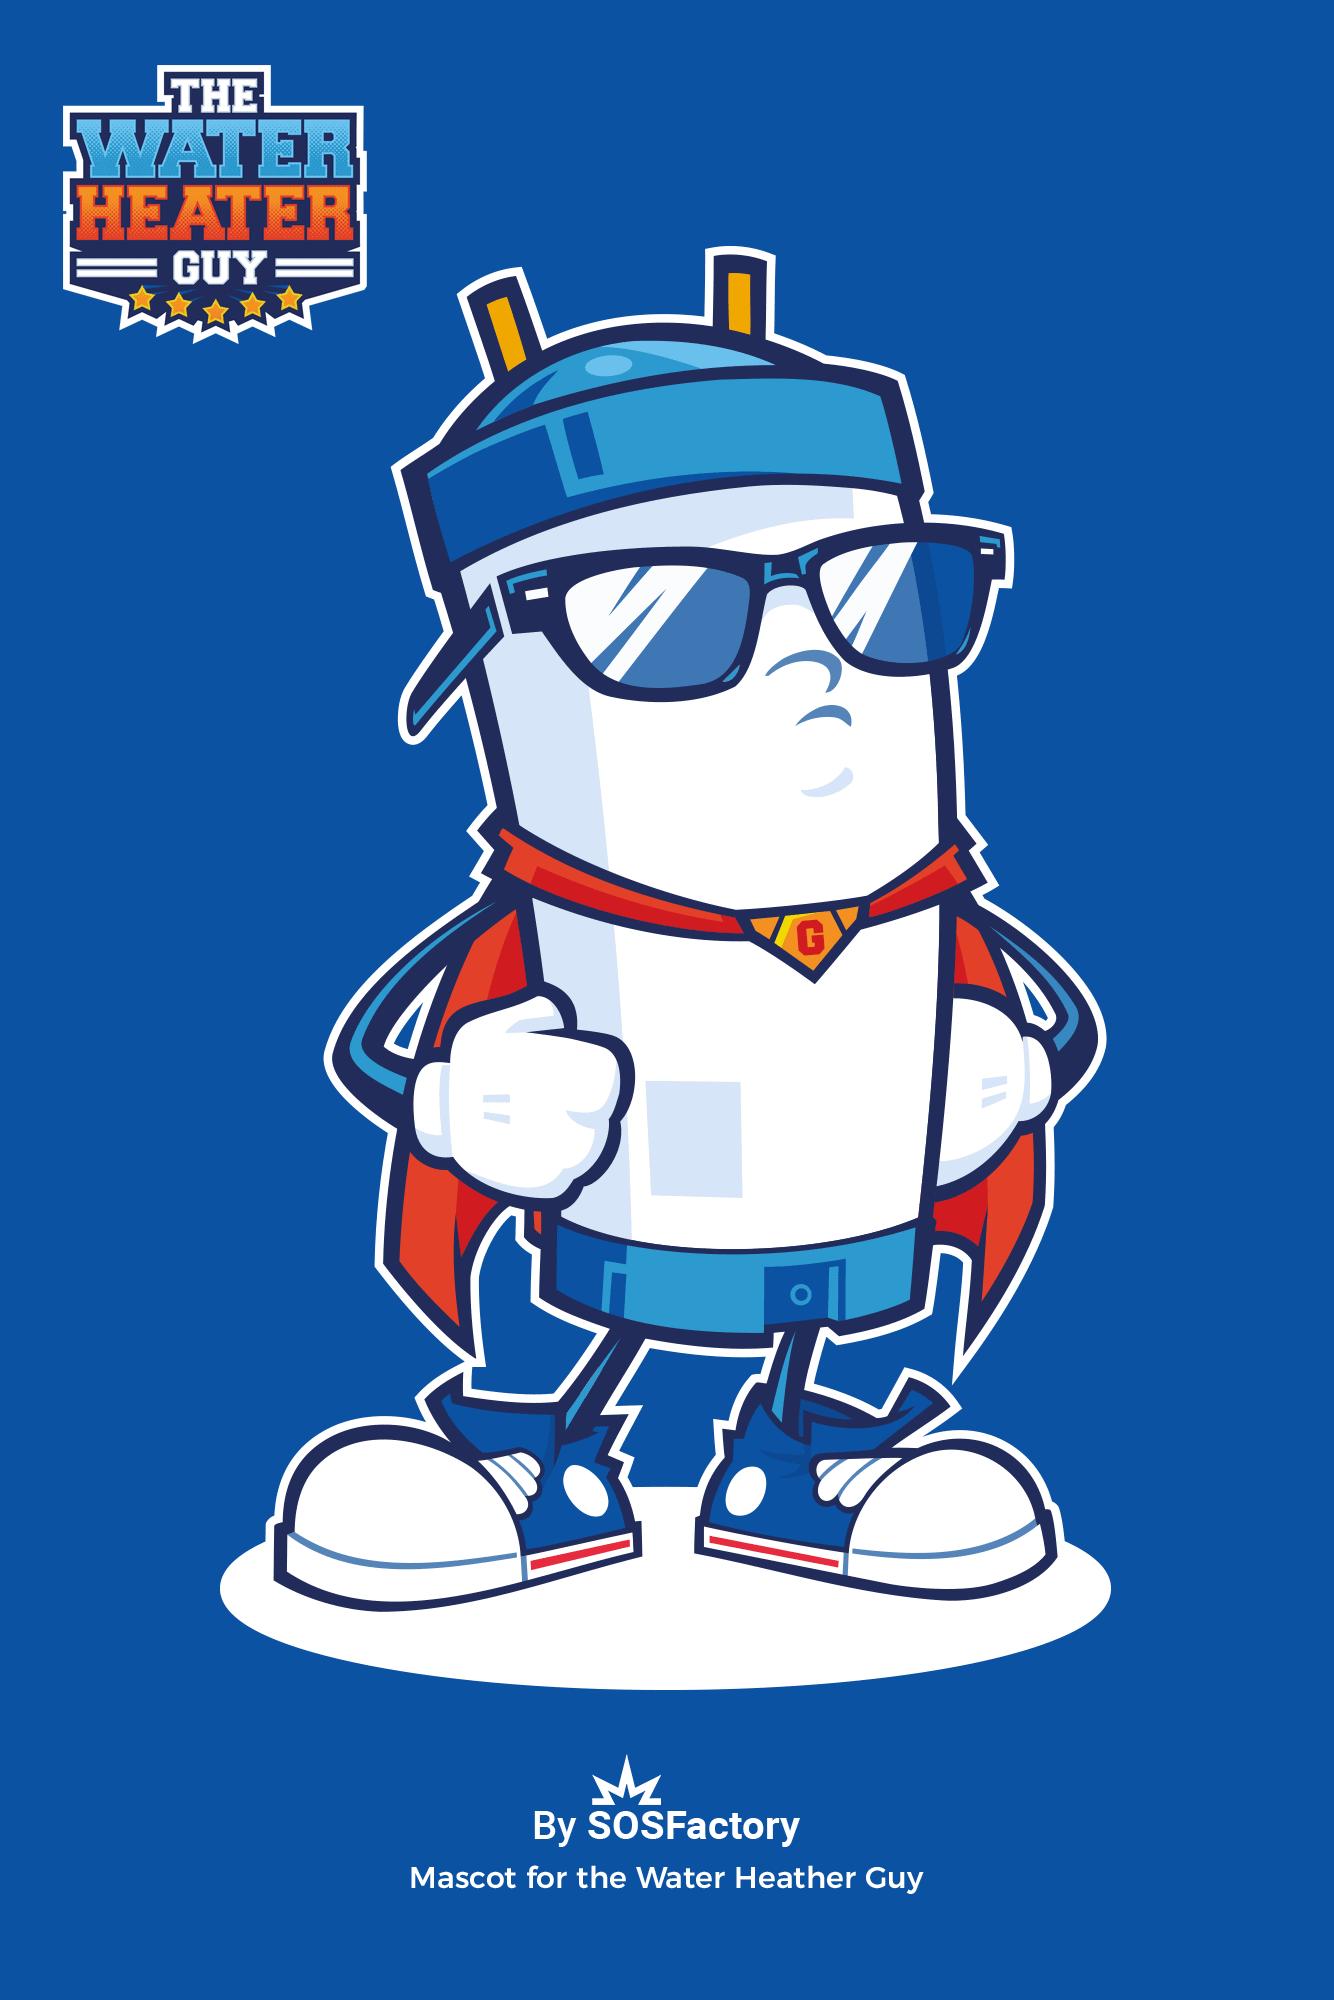 Mascot character object